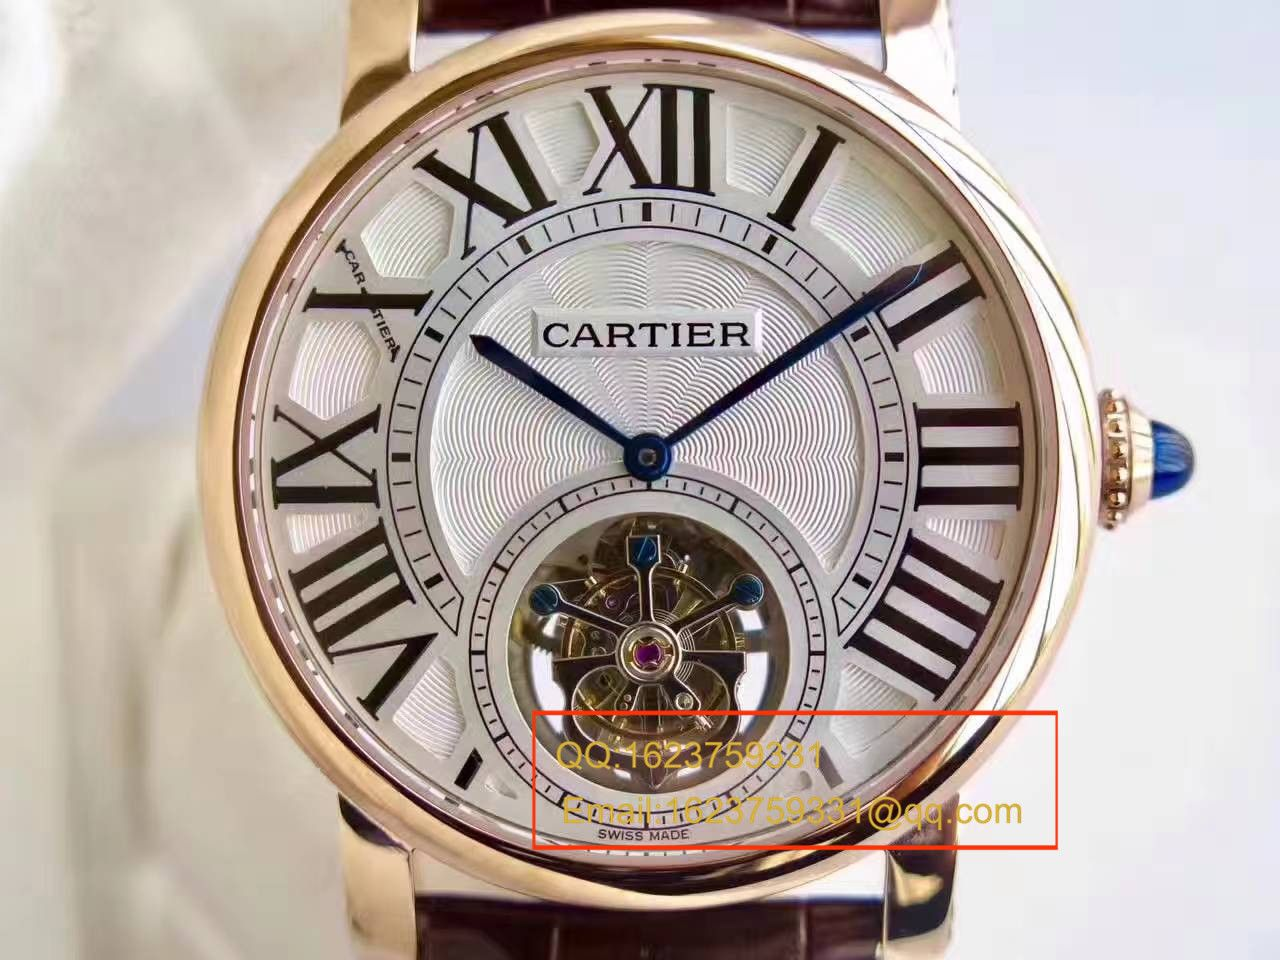 【BL厂一比一复刻手表】卡地亚ROTONDE DE CARTIER系列W1556215陀飞轮腕表 / KCI115